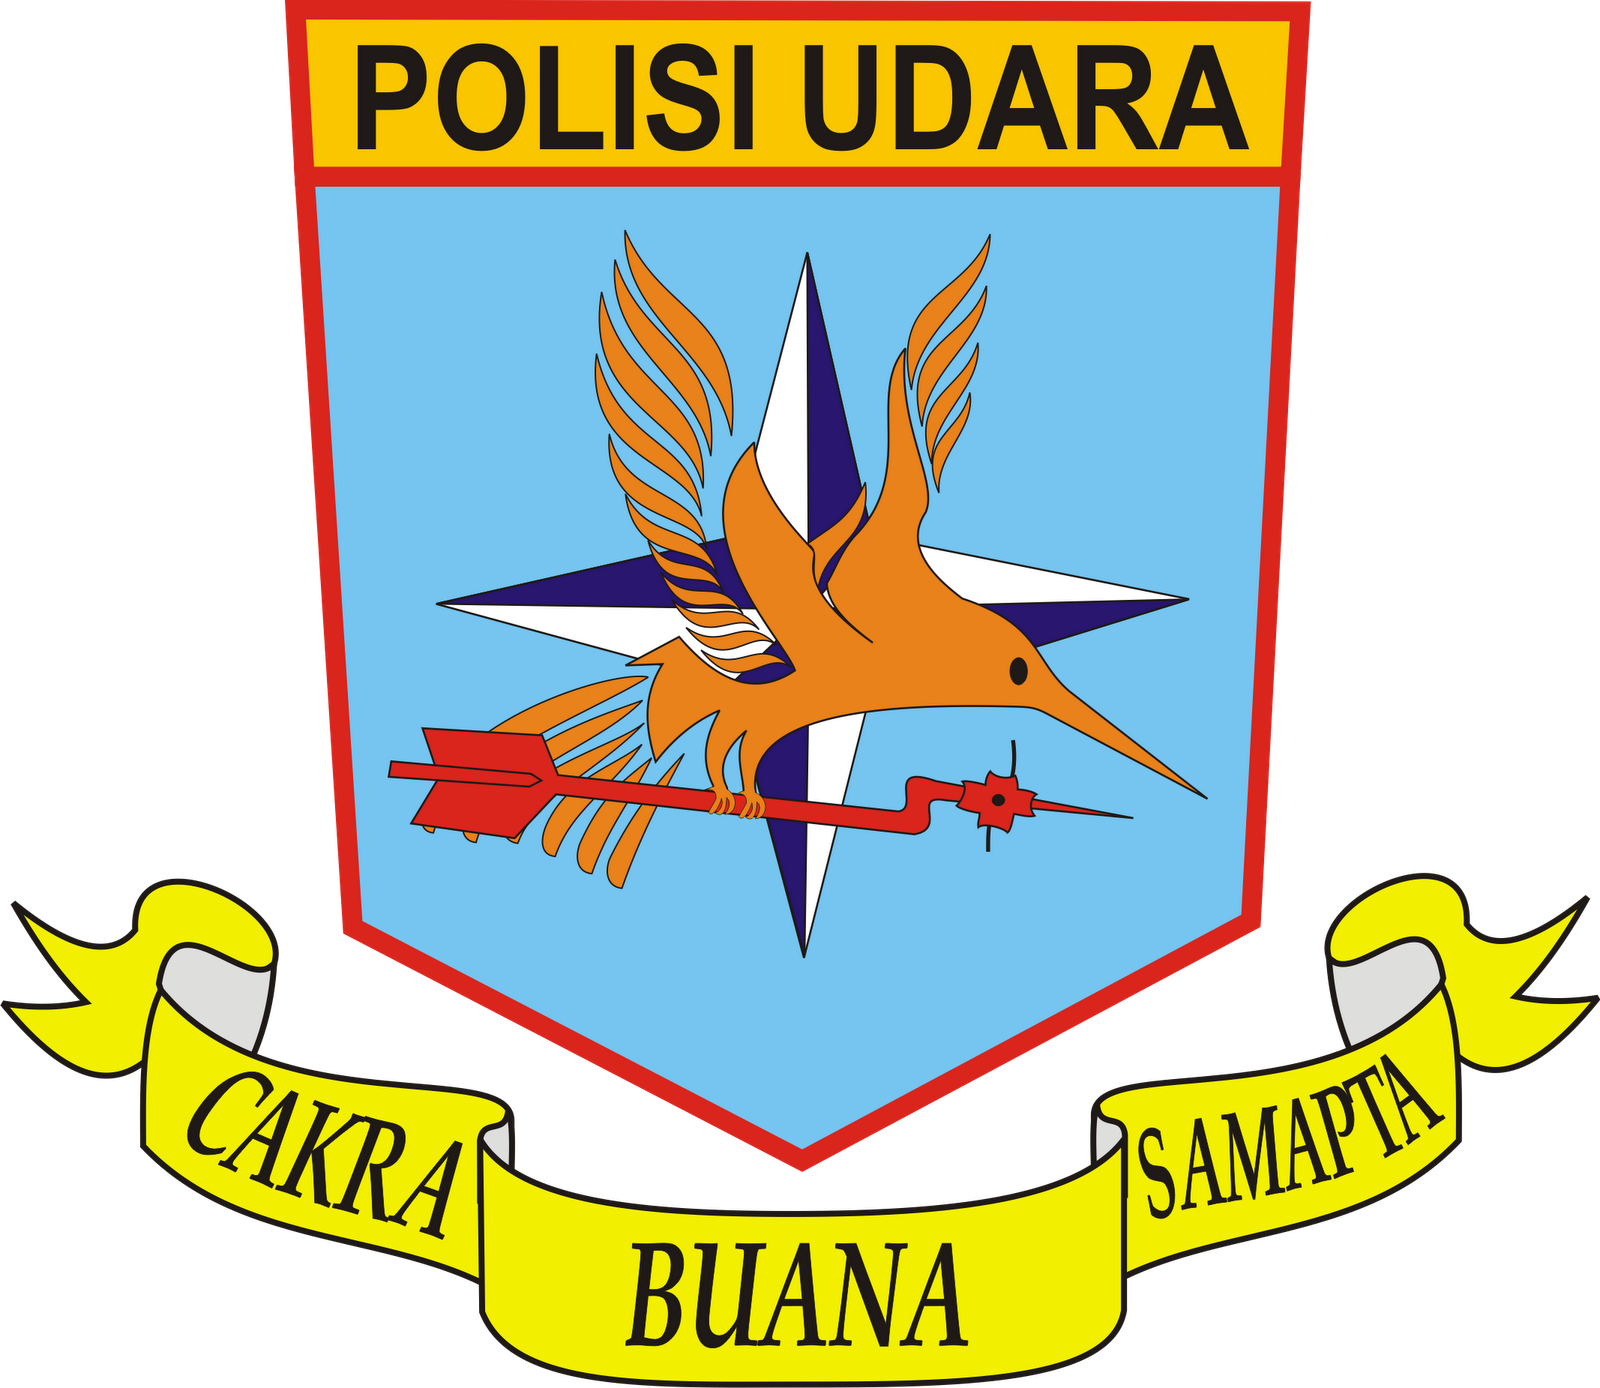 Logo Polisi Udara dan Logo Gegana - Ardi La Madi's Blog